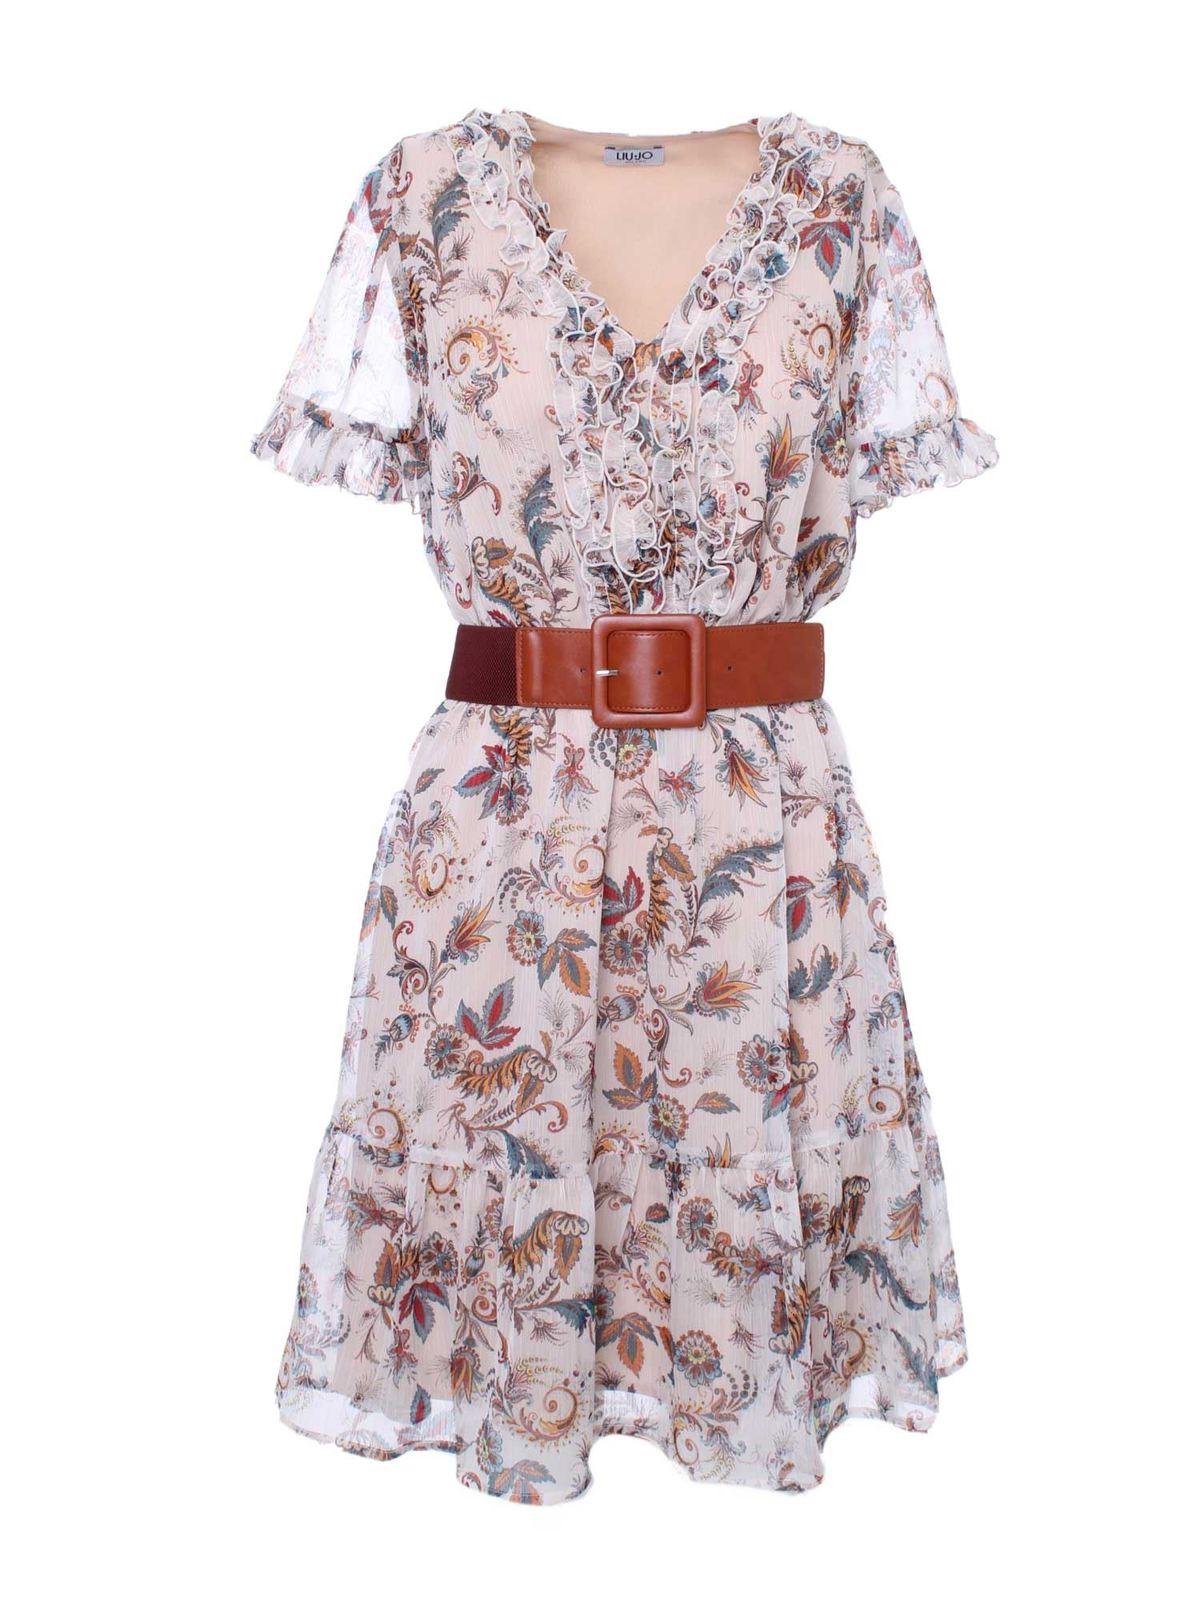 Liu •jo FLORAL PRINT DRESS IN CREAM COLOR